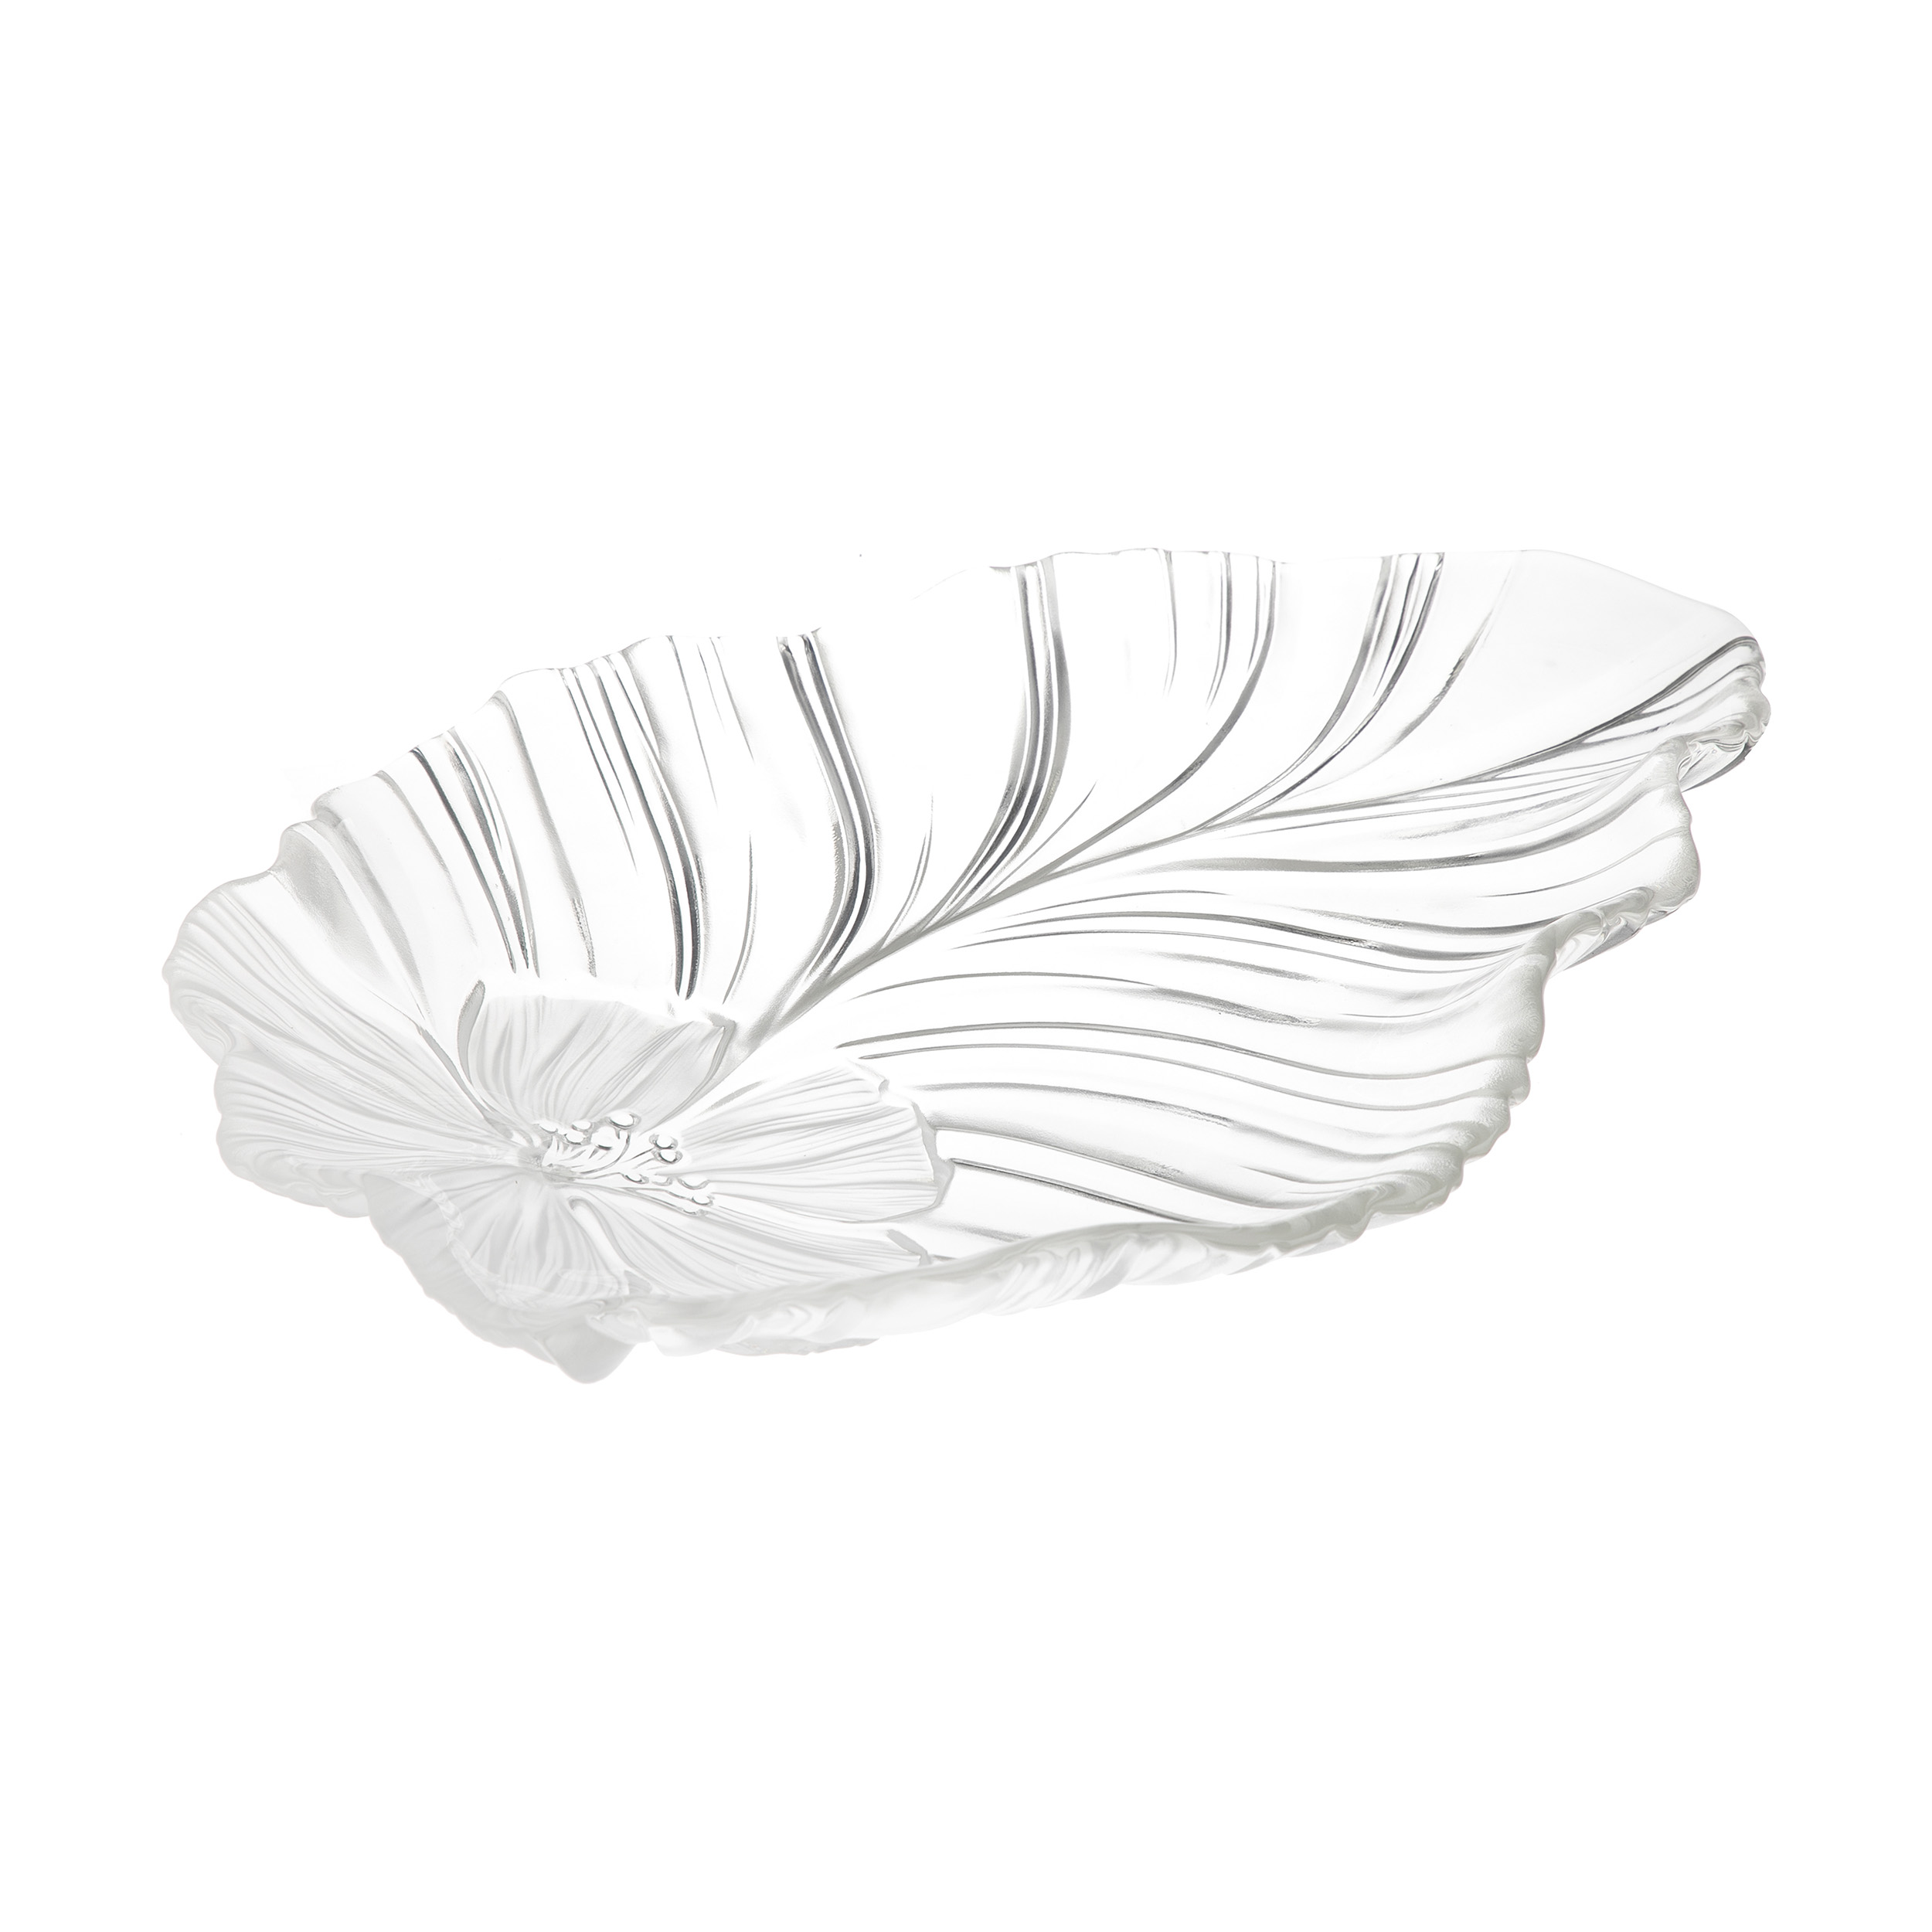 ظرف سرو والترگلس مدل Leaf